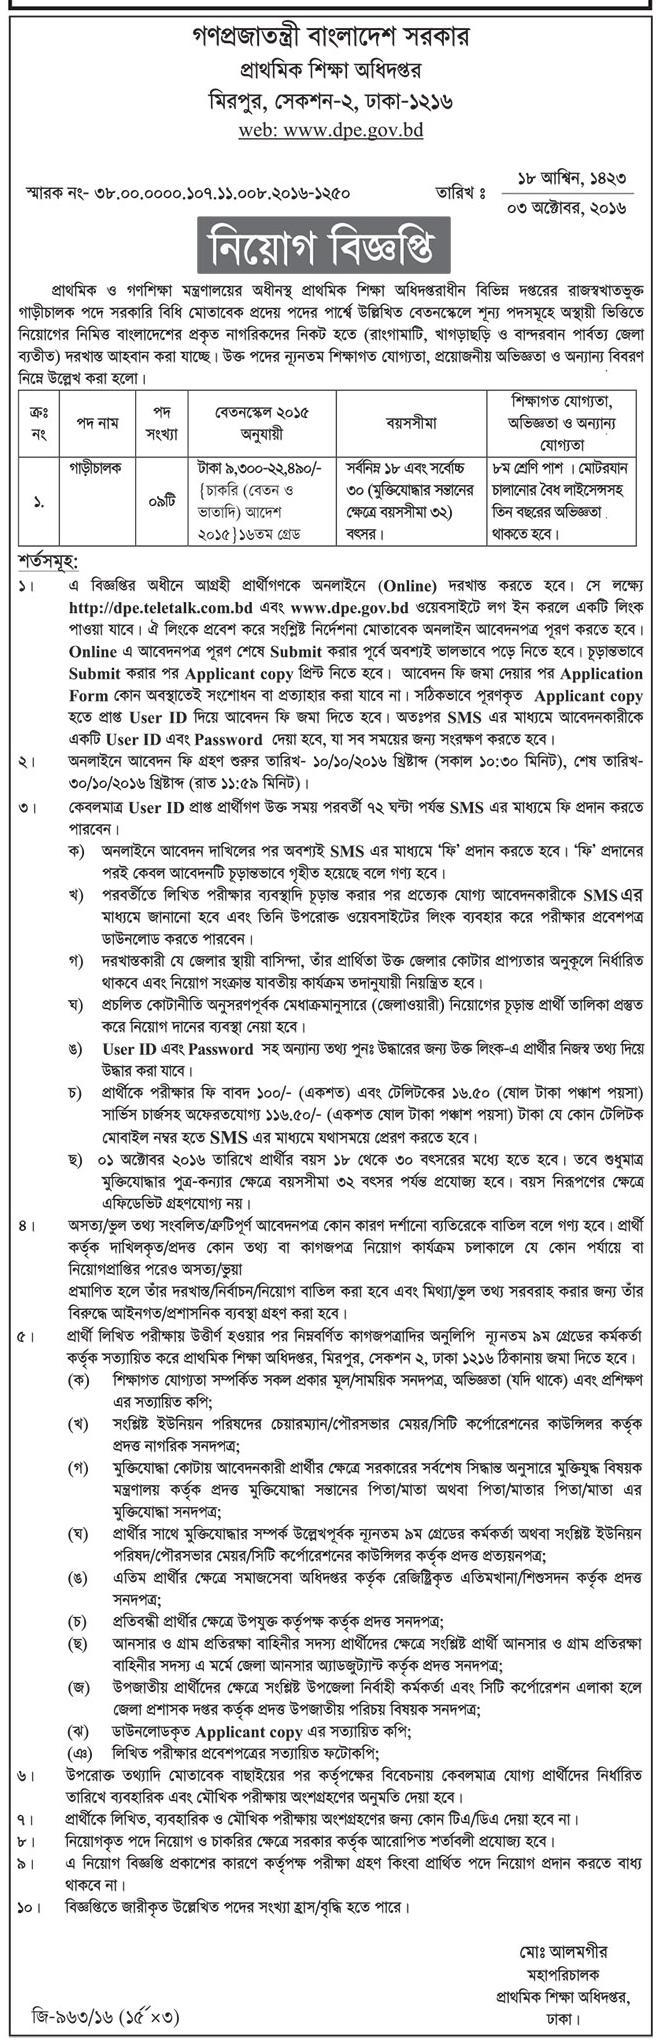 DPE 488 Posts Govt Job Circular 2016